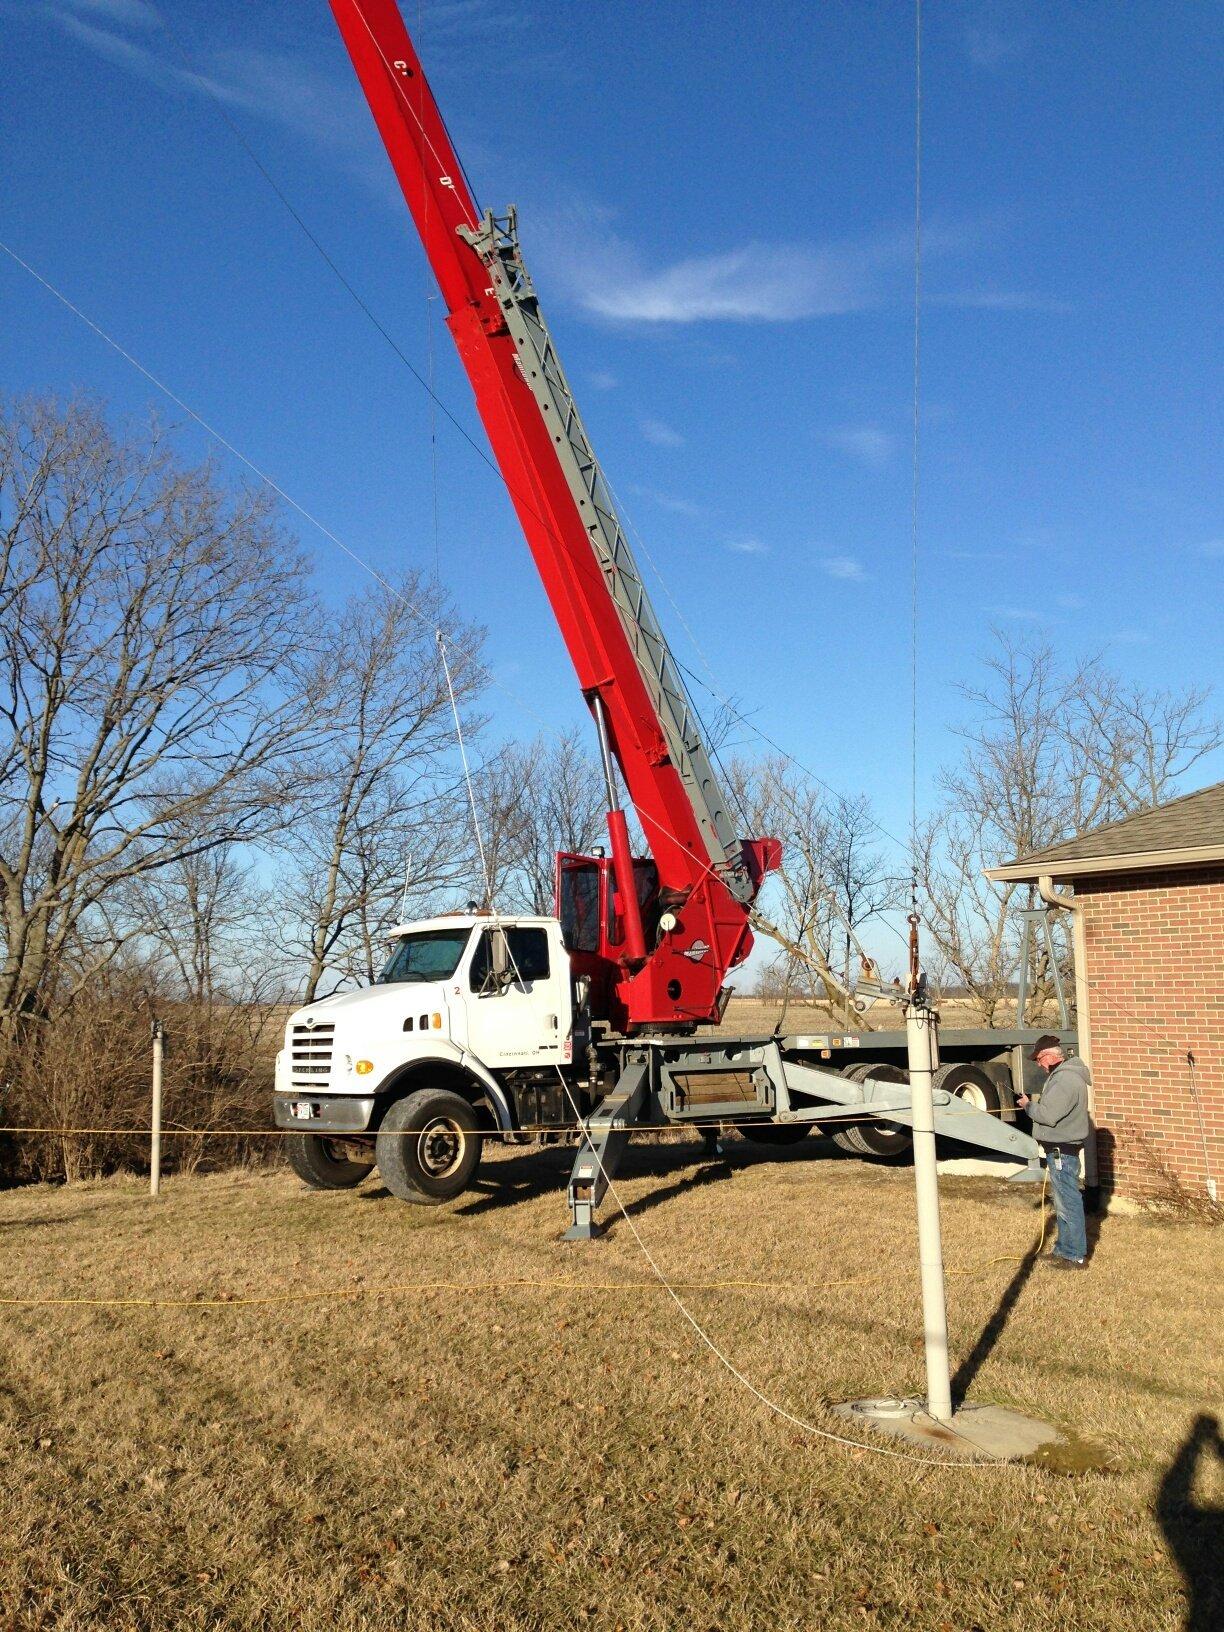 Crane operator working in a construction area in Cincinnati, OH.